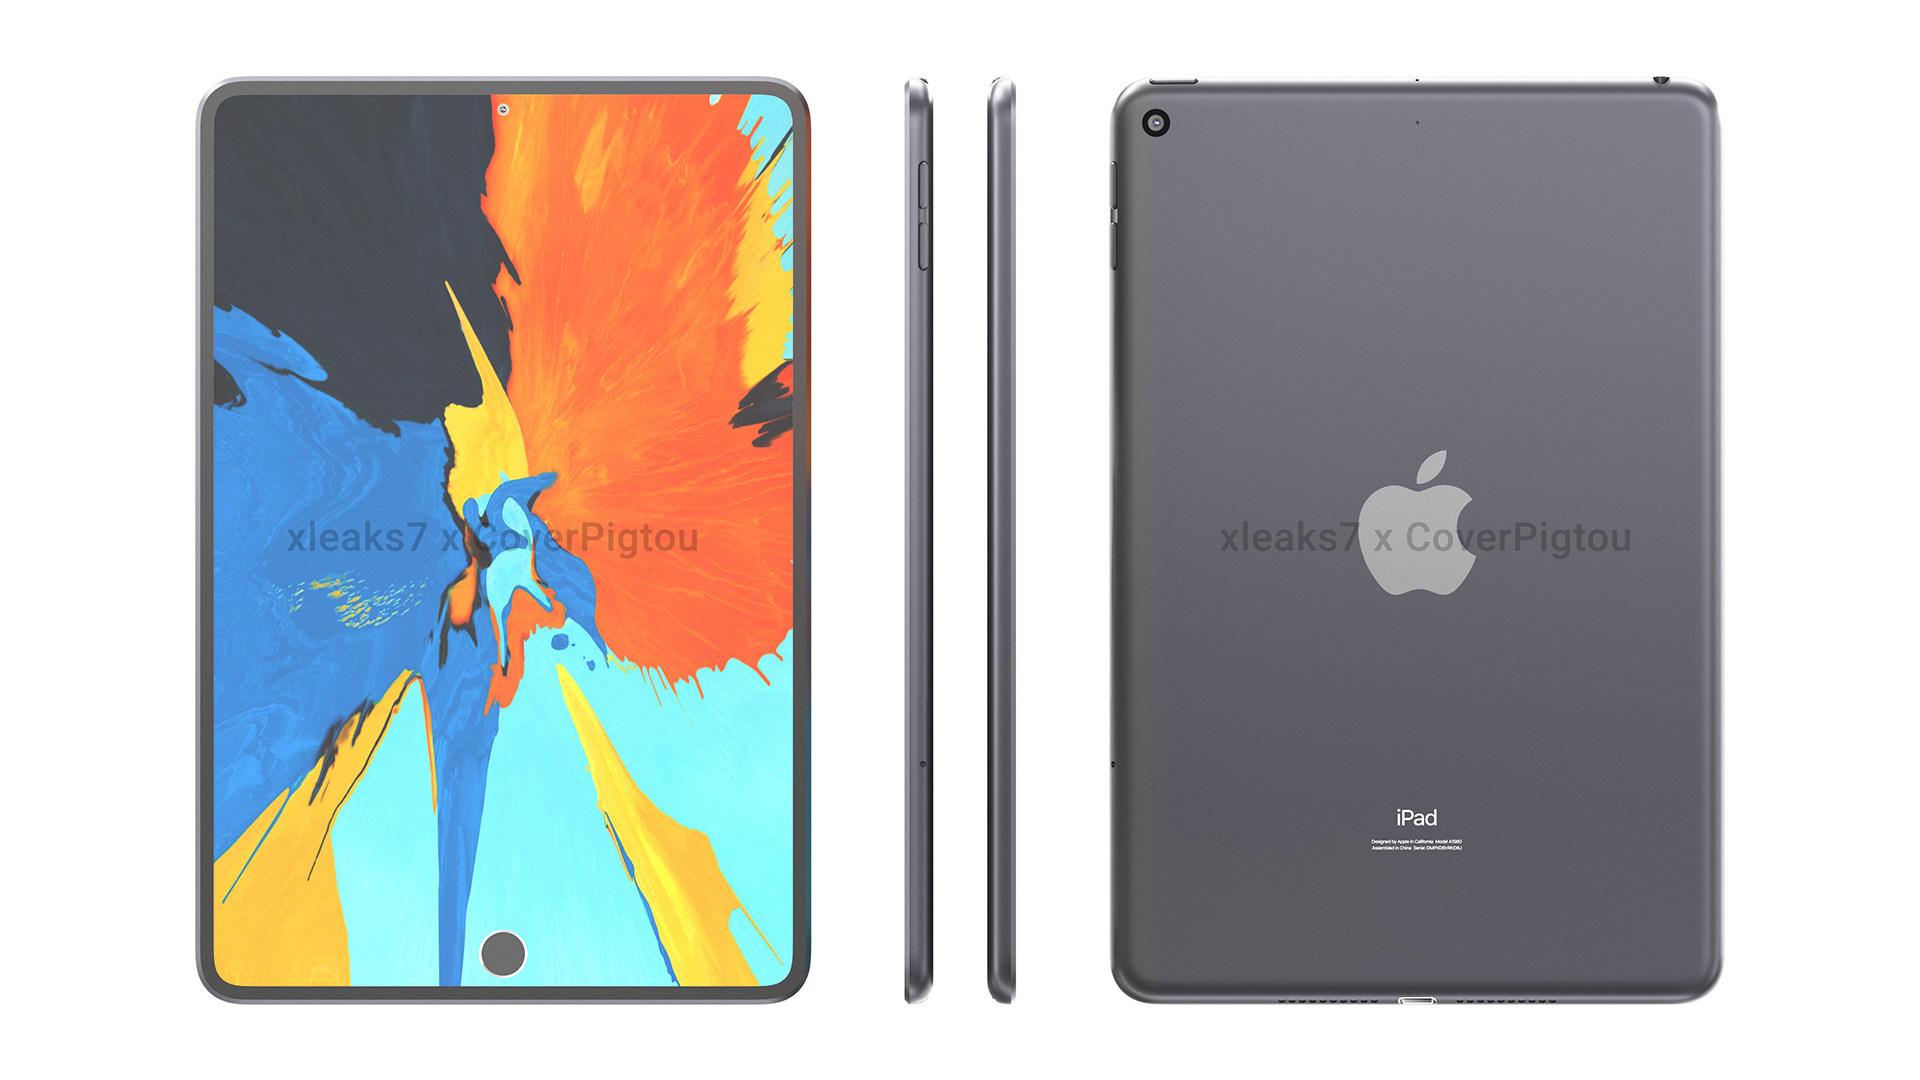 Apple, Gerüchte, Tablets, Leaks, Renderbilder, Renderbild, iPadOS, Rendering, iPad Mini 2021, iPad Mini 6